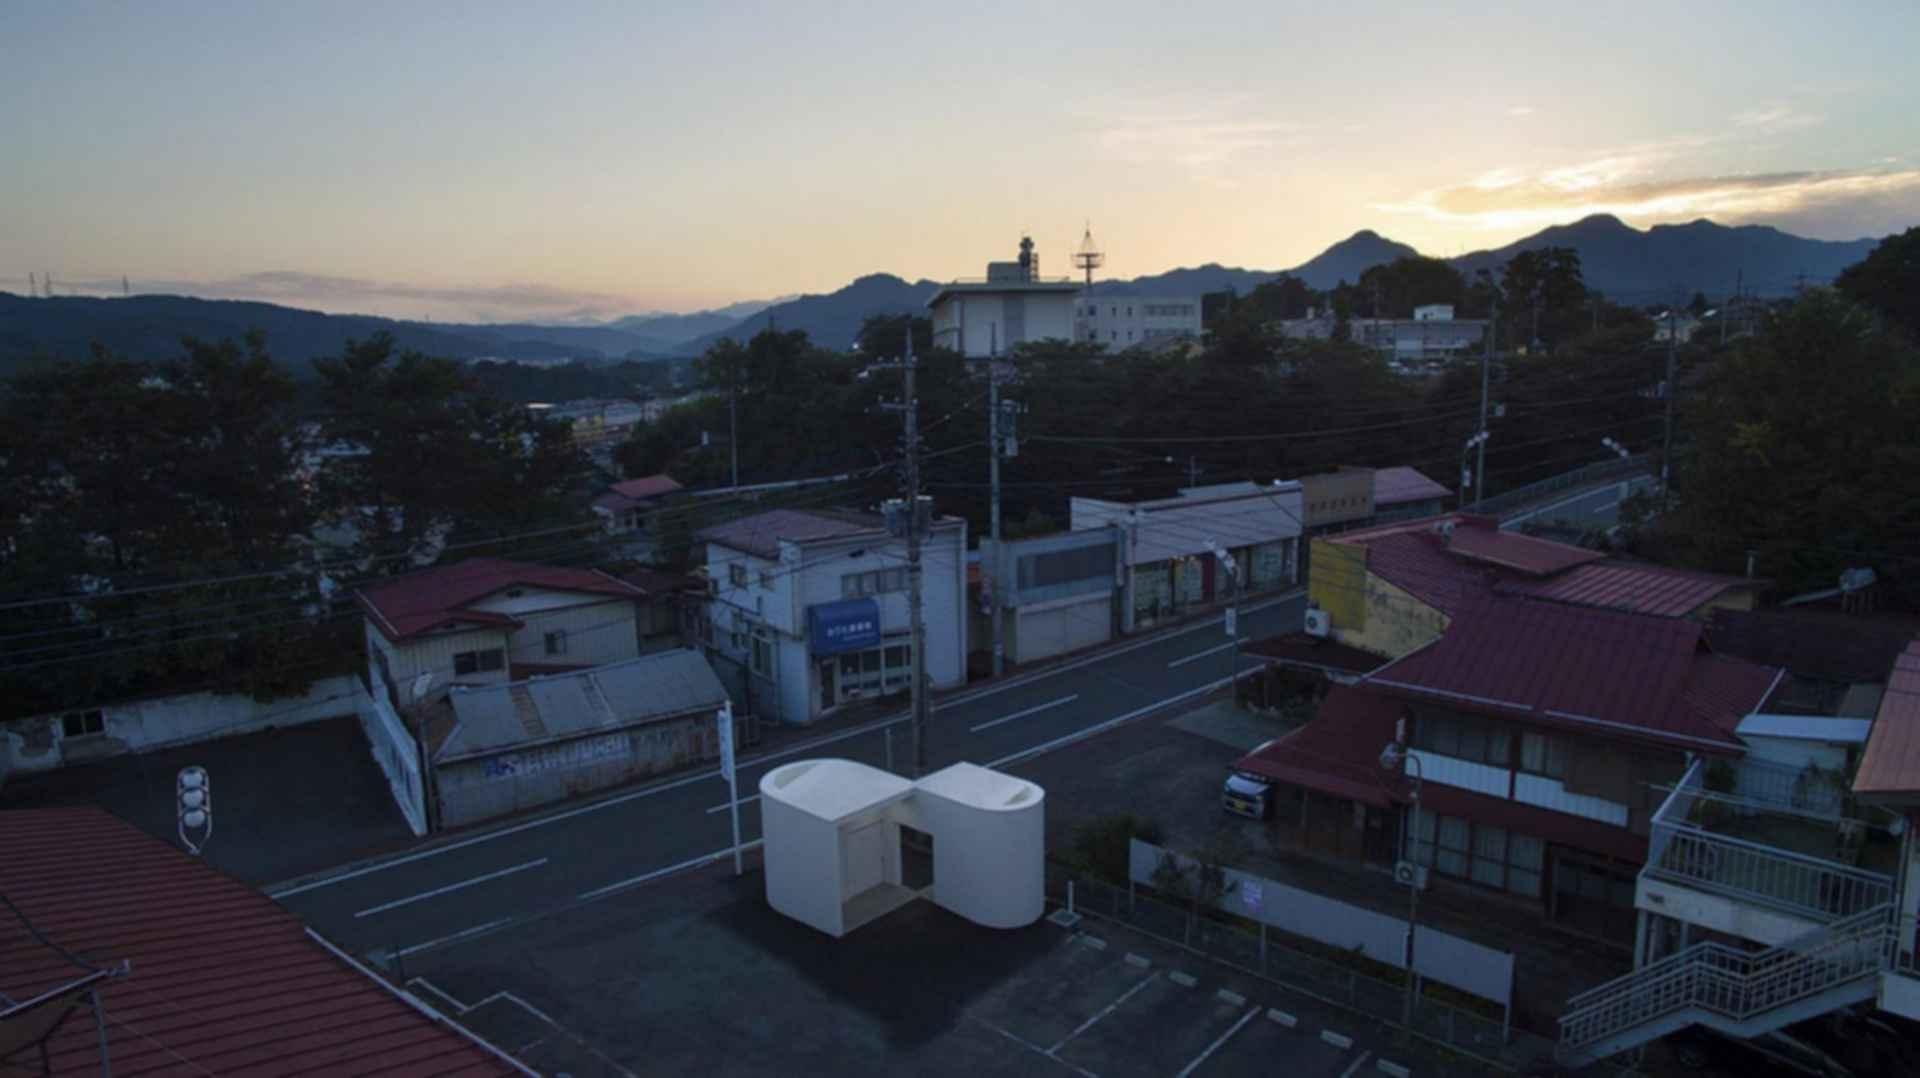 Isemachi Public Toilet - exterior/birds eye view